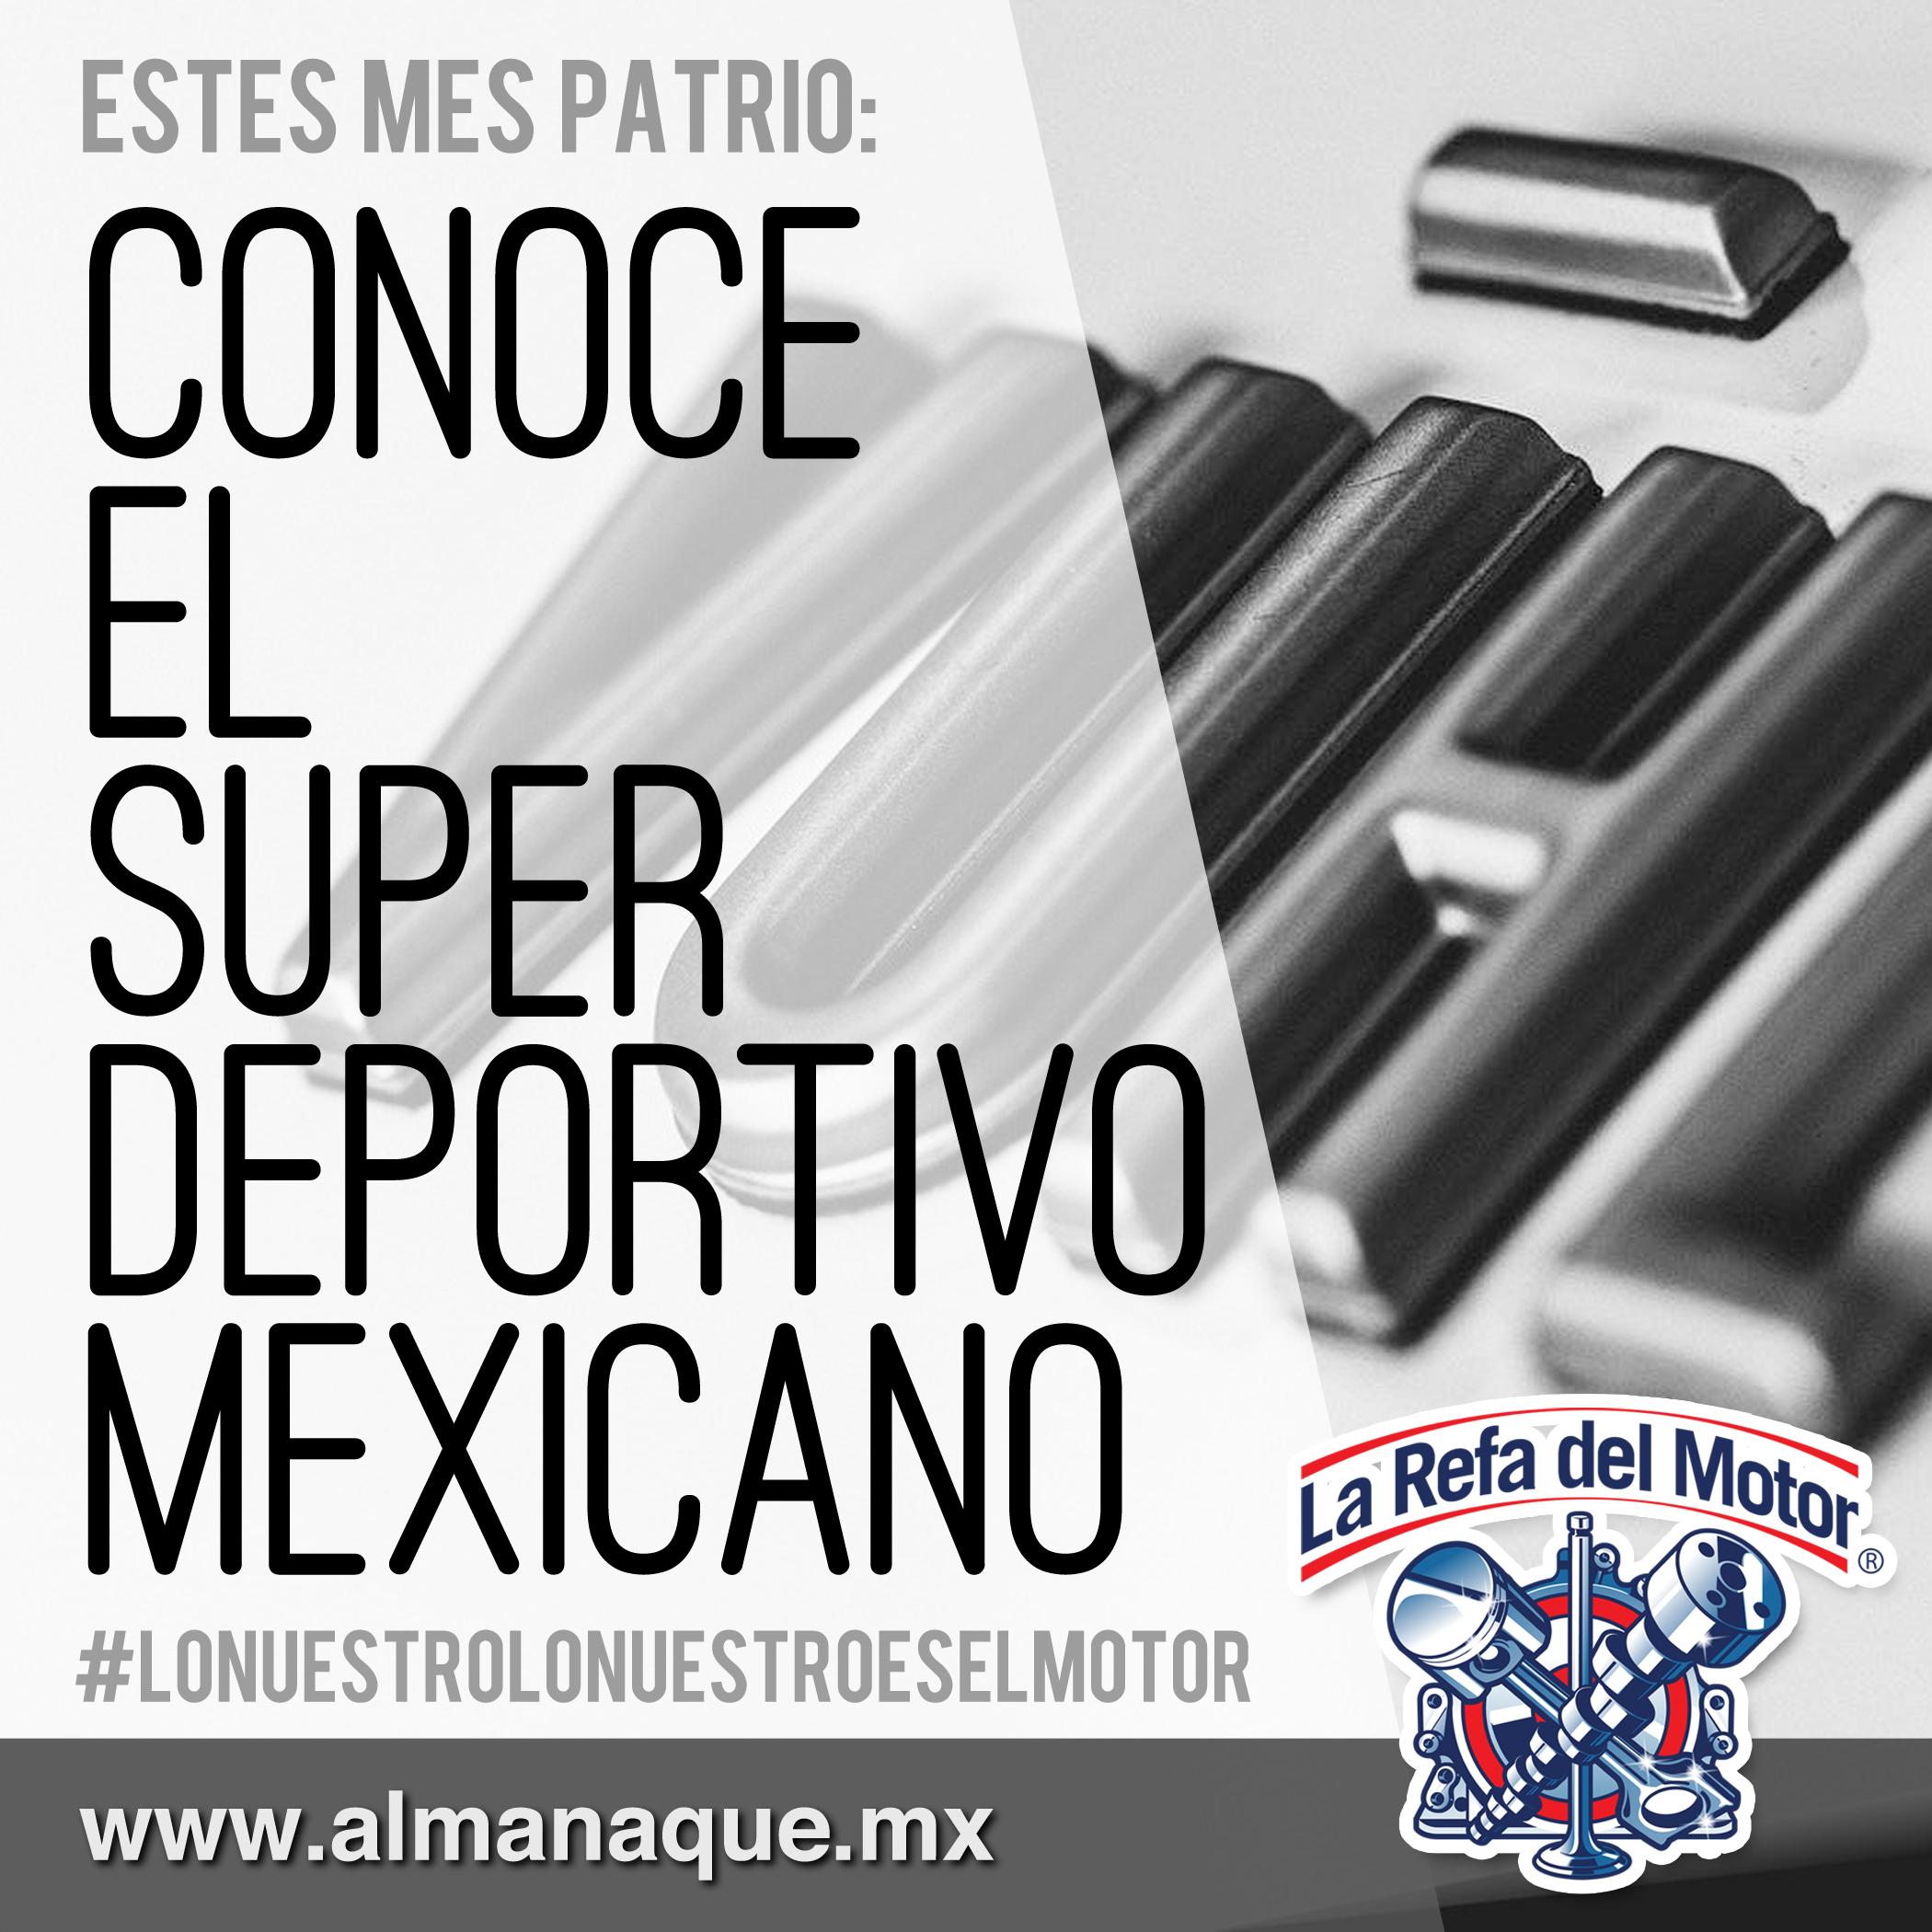 la-refa-del-motor-vuhl-auto-mexicano-almanaque-mx-blog